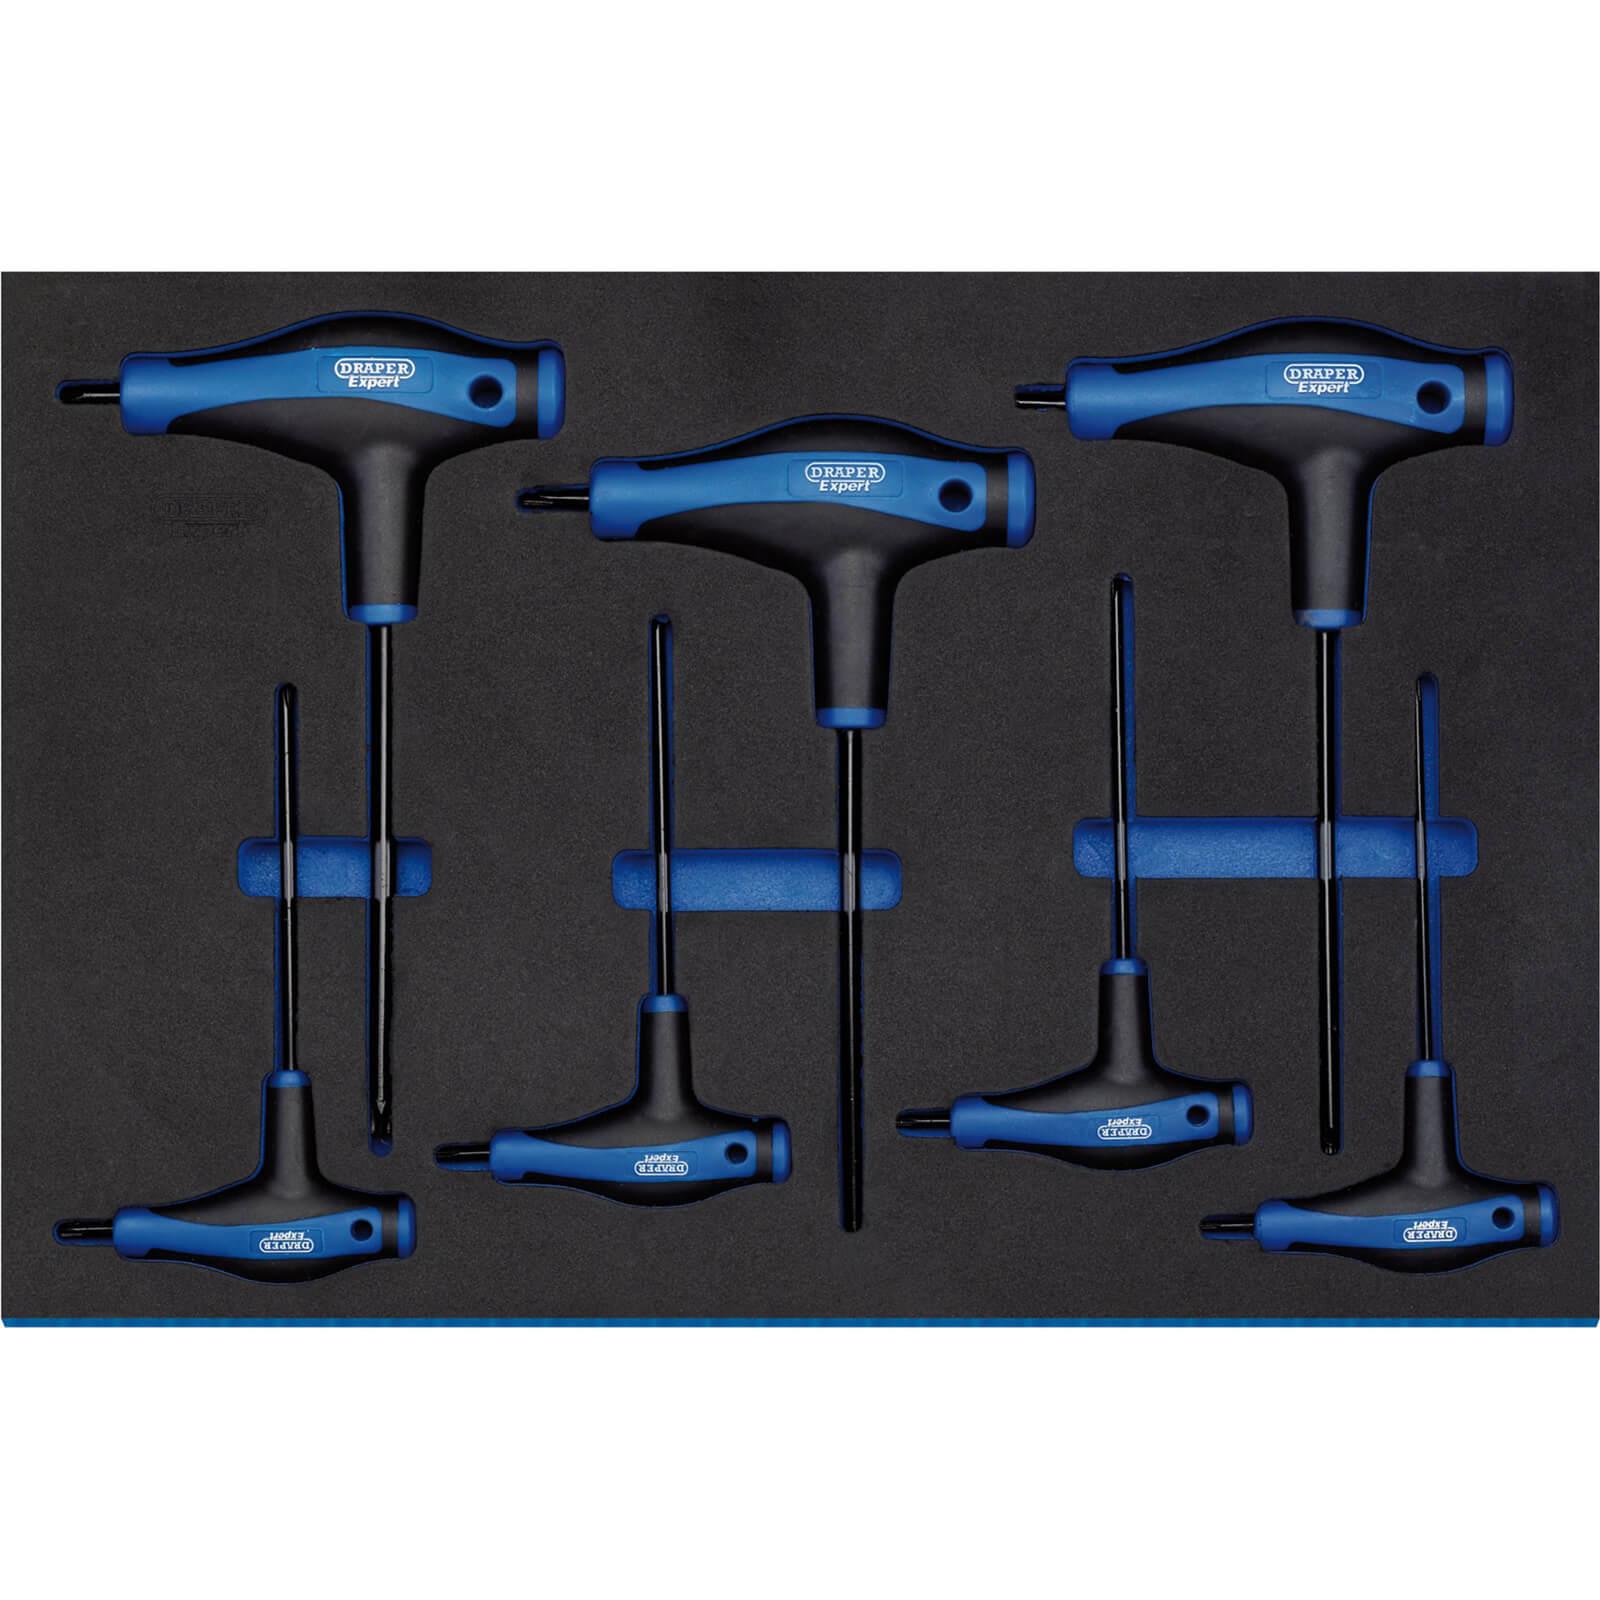 Image of Draper 7 Piece T Handle Tx-Star Key Set In Eva Insert Tray